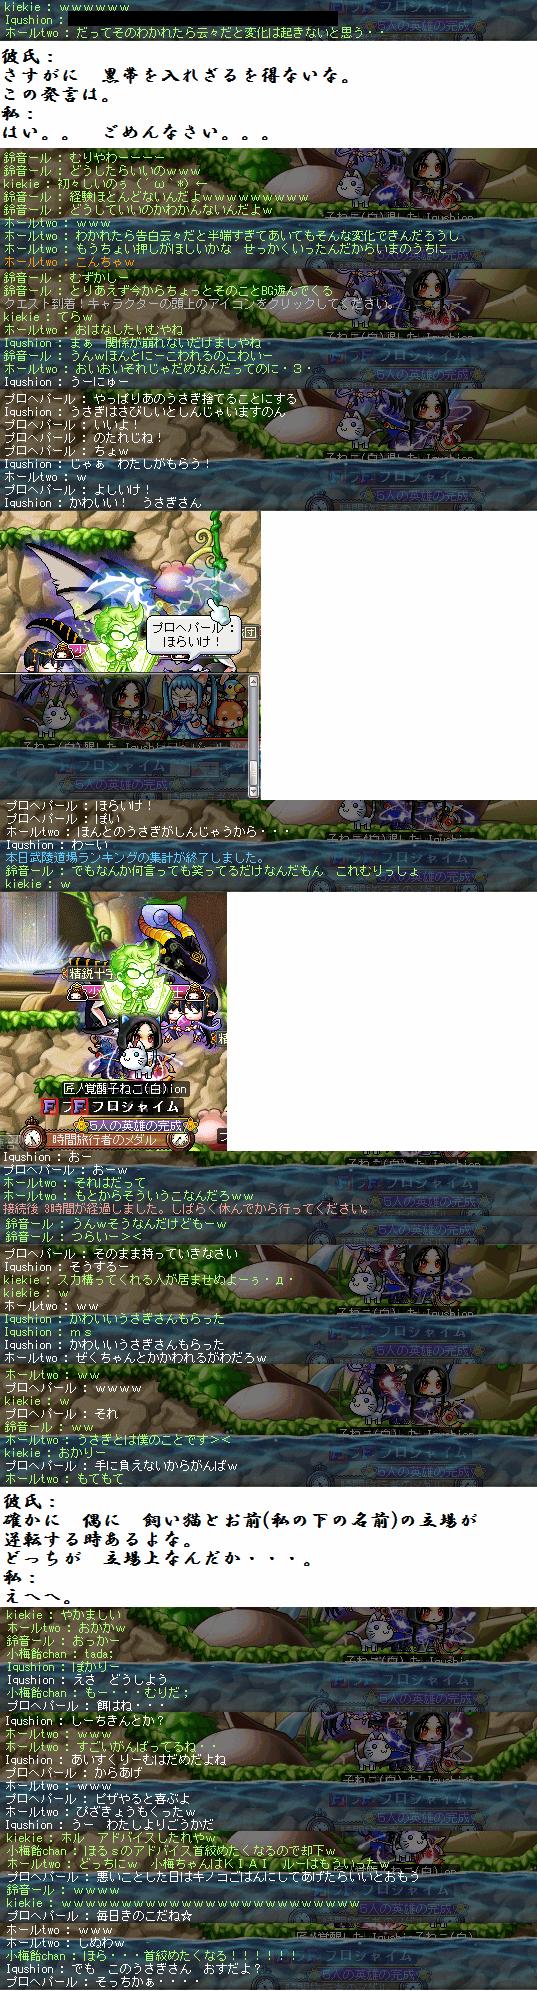 2013_0415_2232 _4